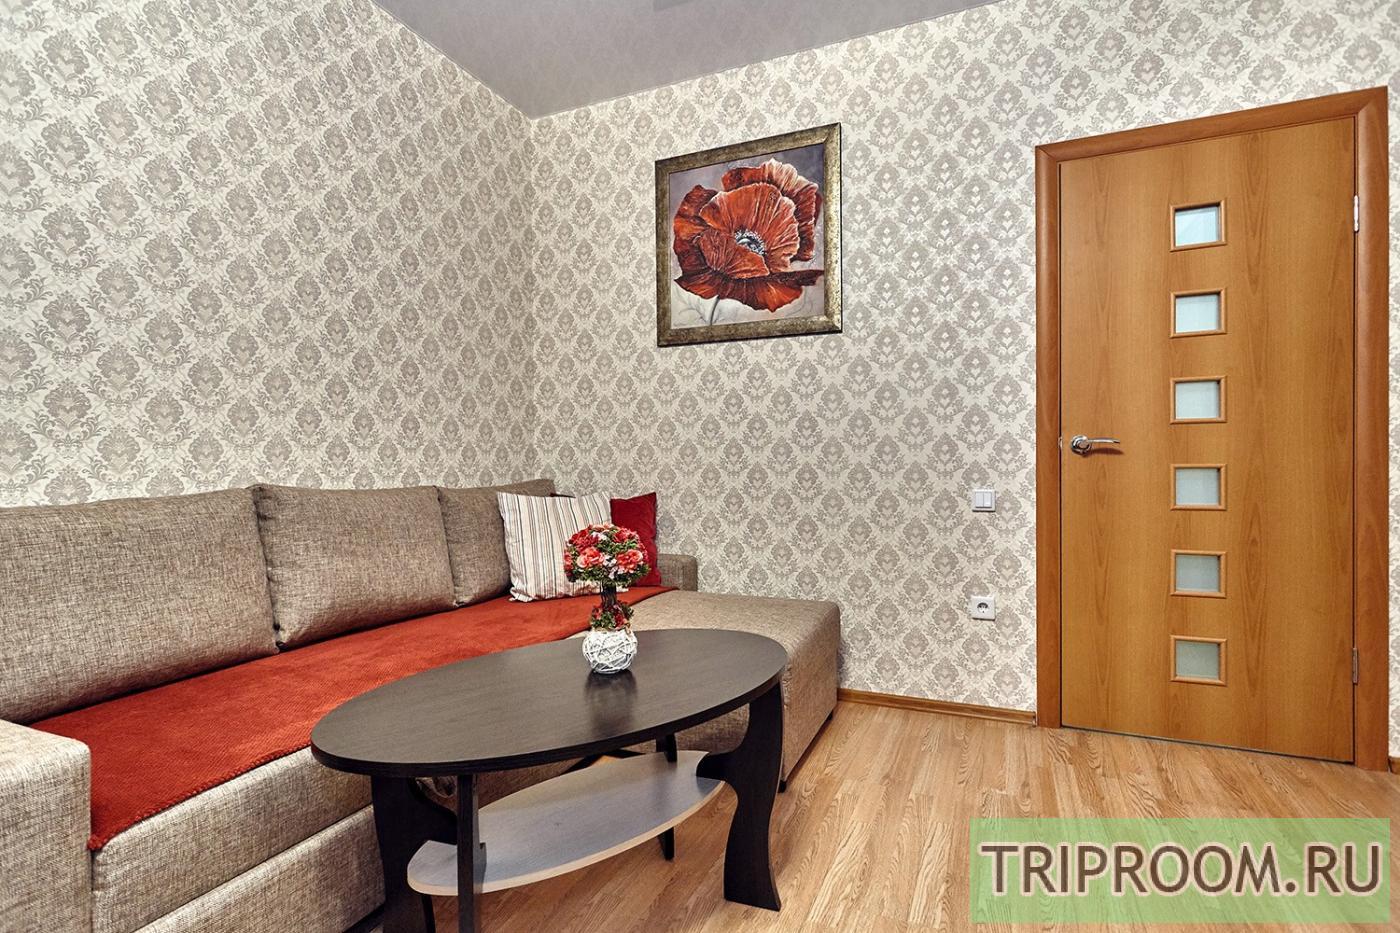 2-комнатная квартира посуточно (вариант № 10581), ул. Соколова улица, фото № 7